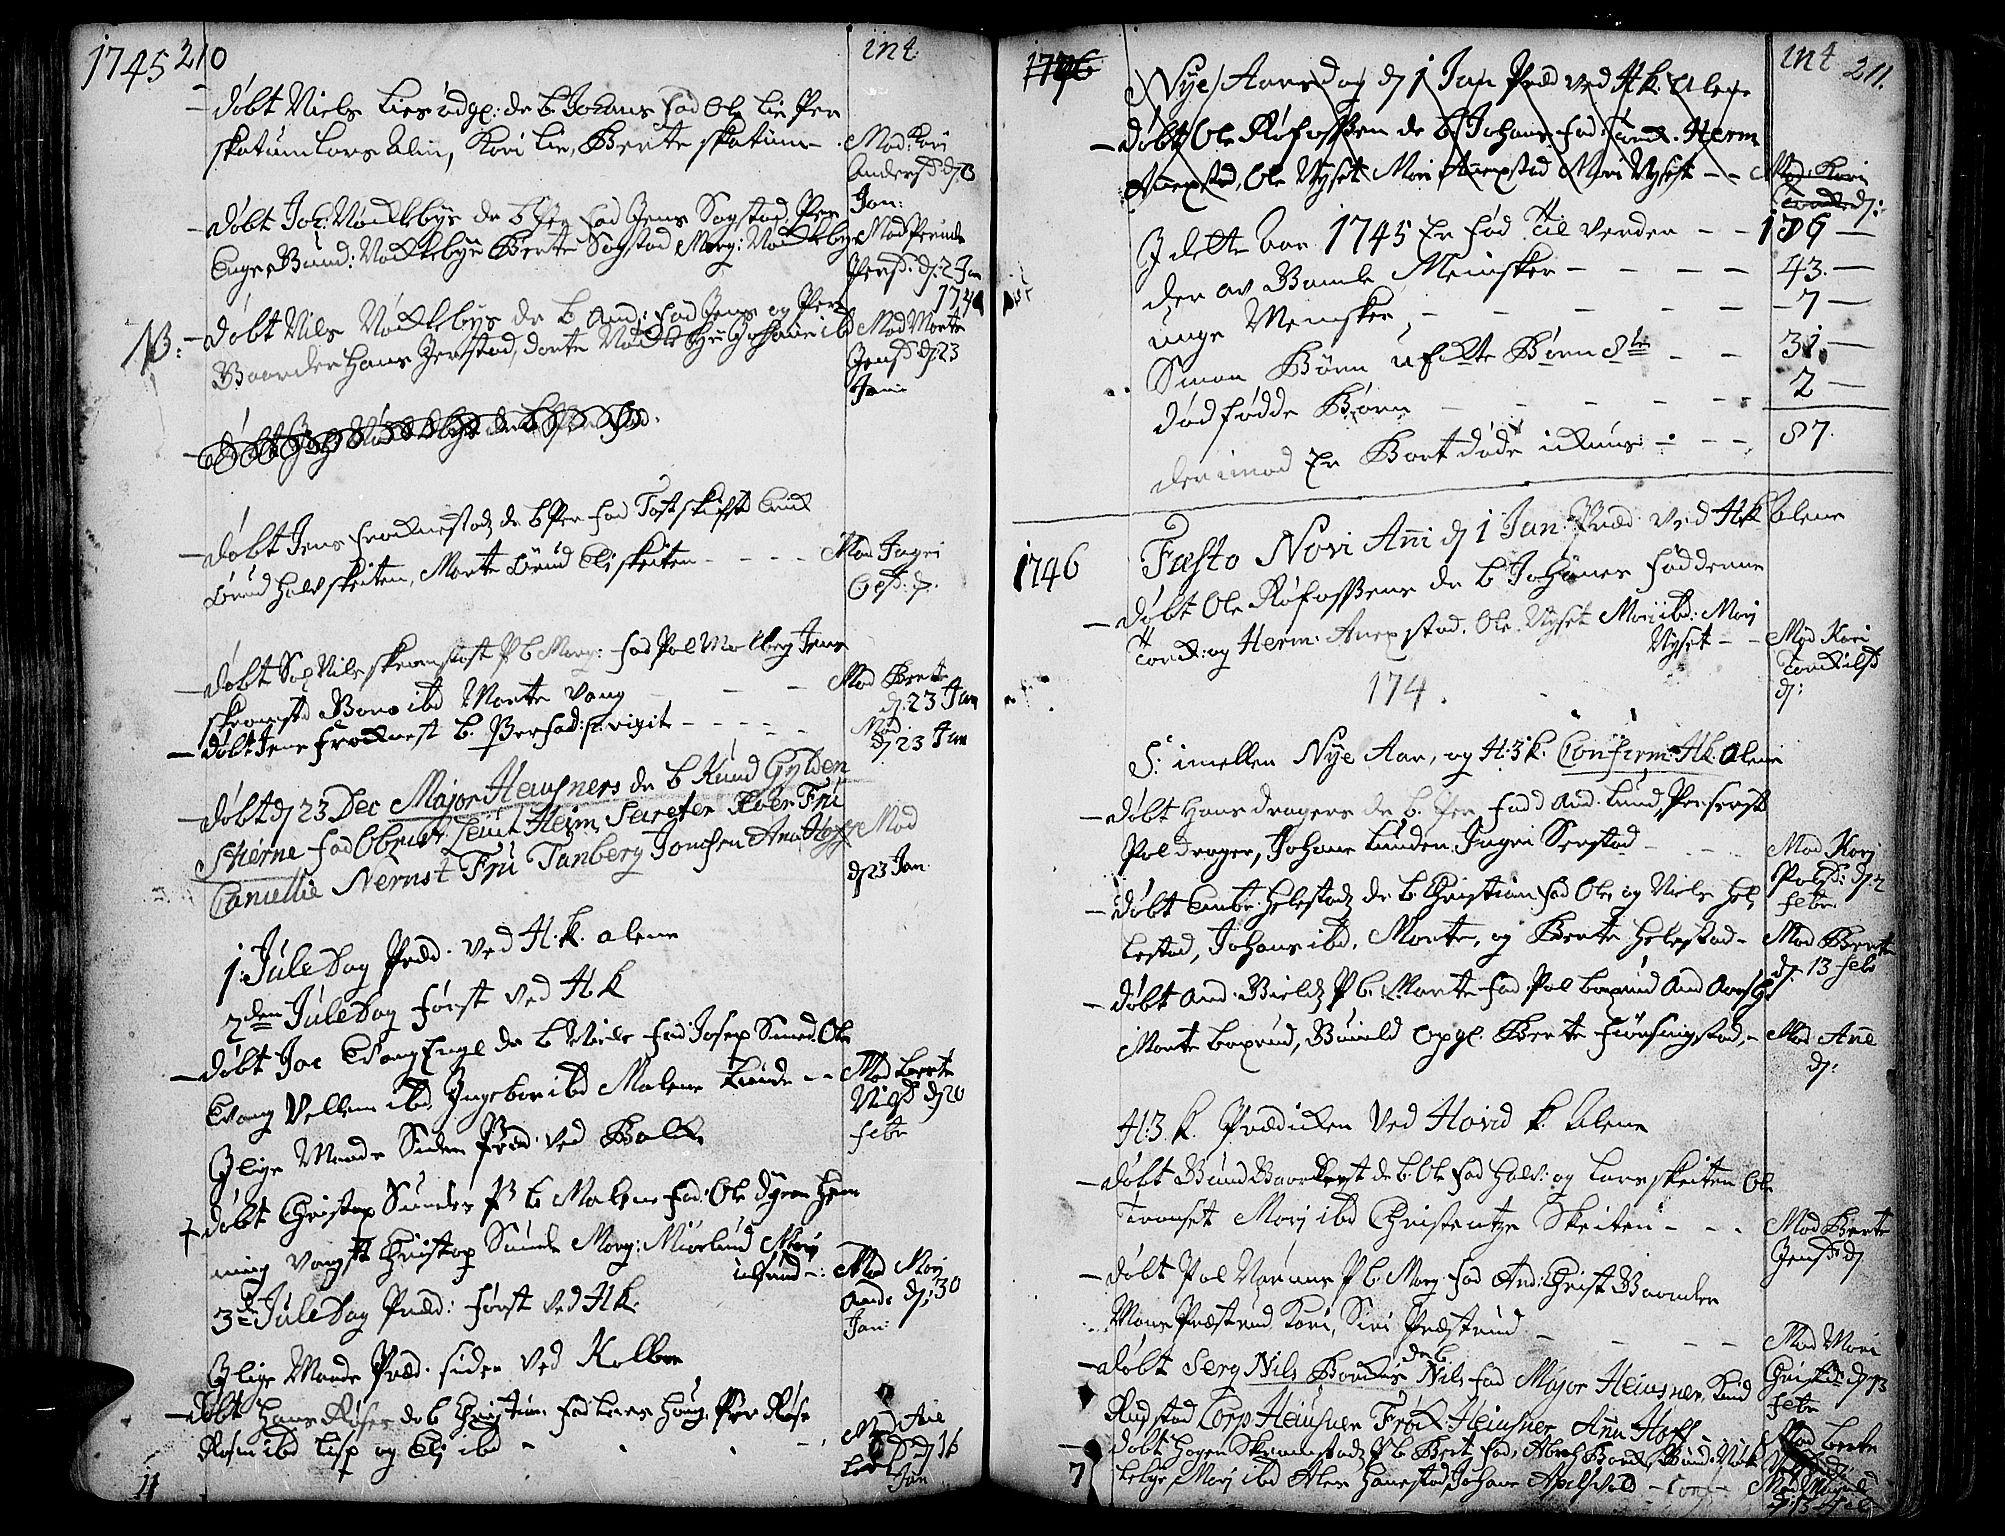 SAH, Toten prestekontor, Ministerialbok nr. 3, 1734-1751, s. 210-211